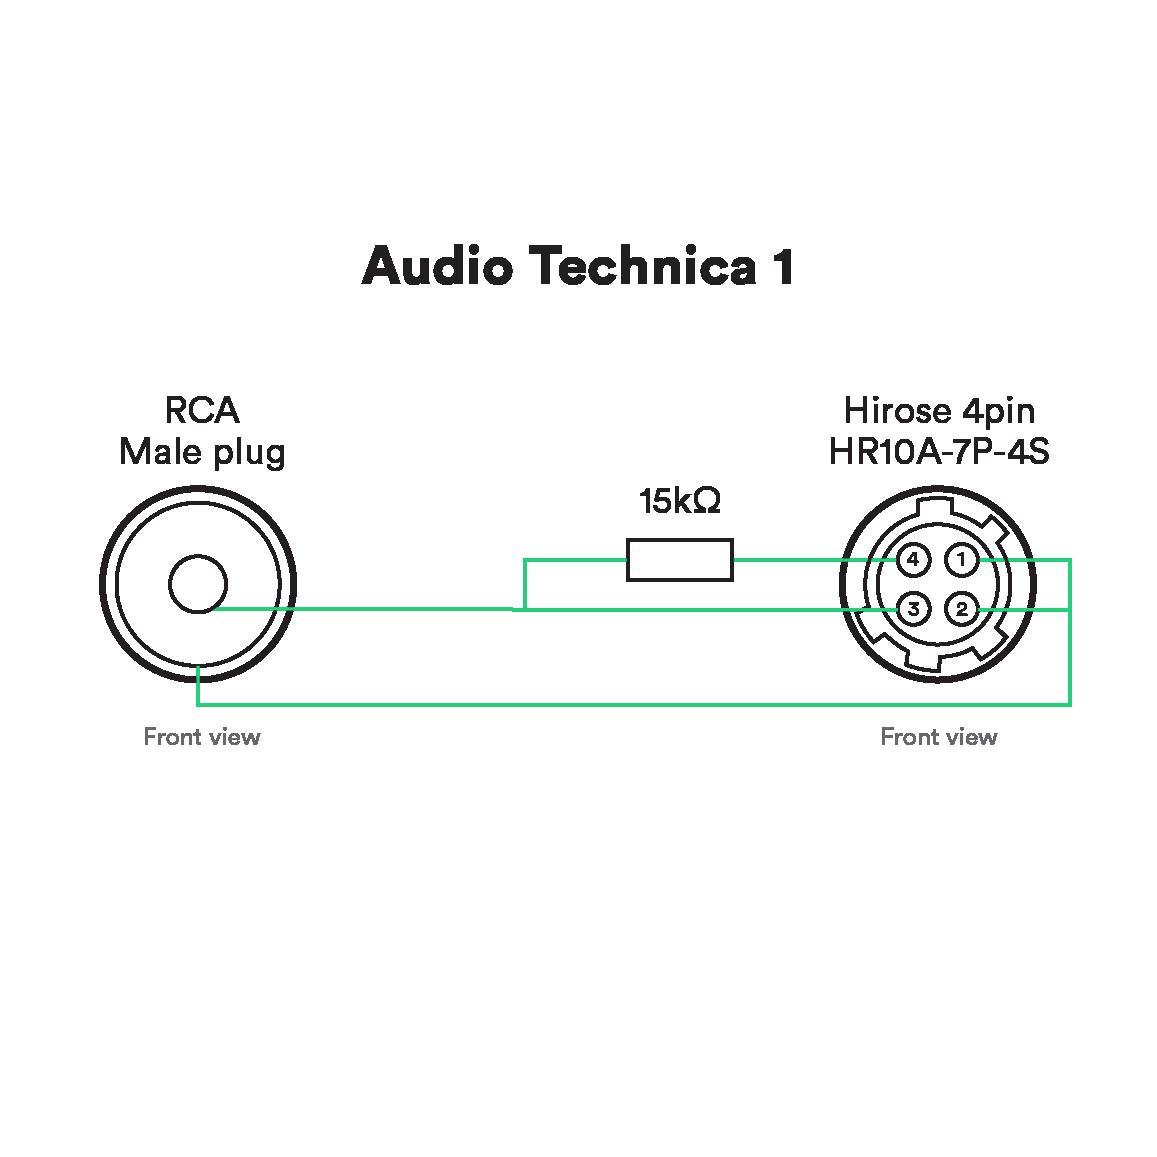 audio technica wiring diagram - wiring diagram schematic bear-guest -  bear-guest.aliceviola.it  aliceviola.it